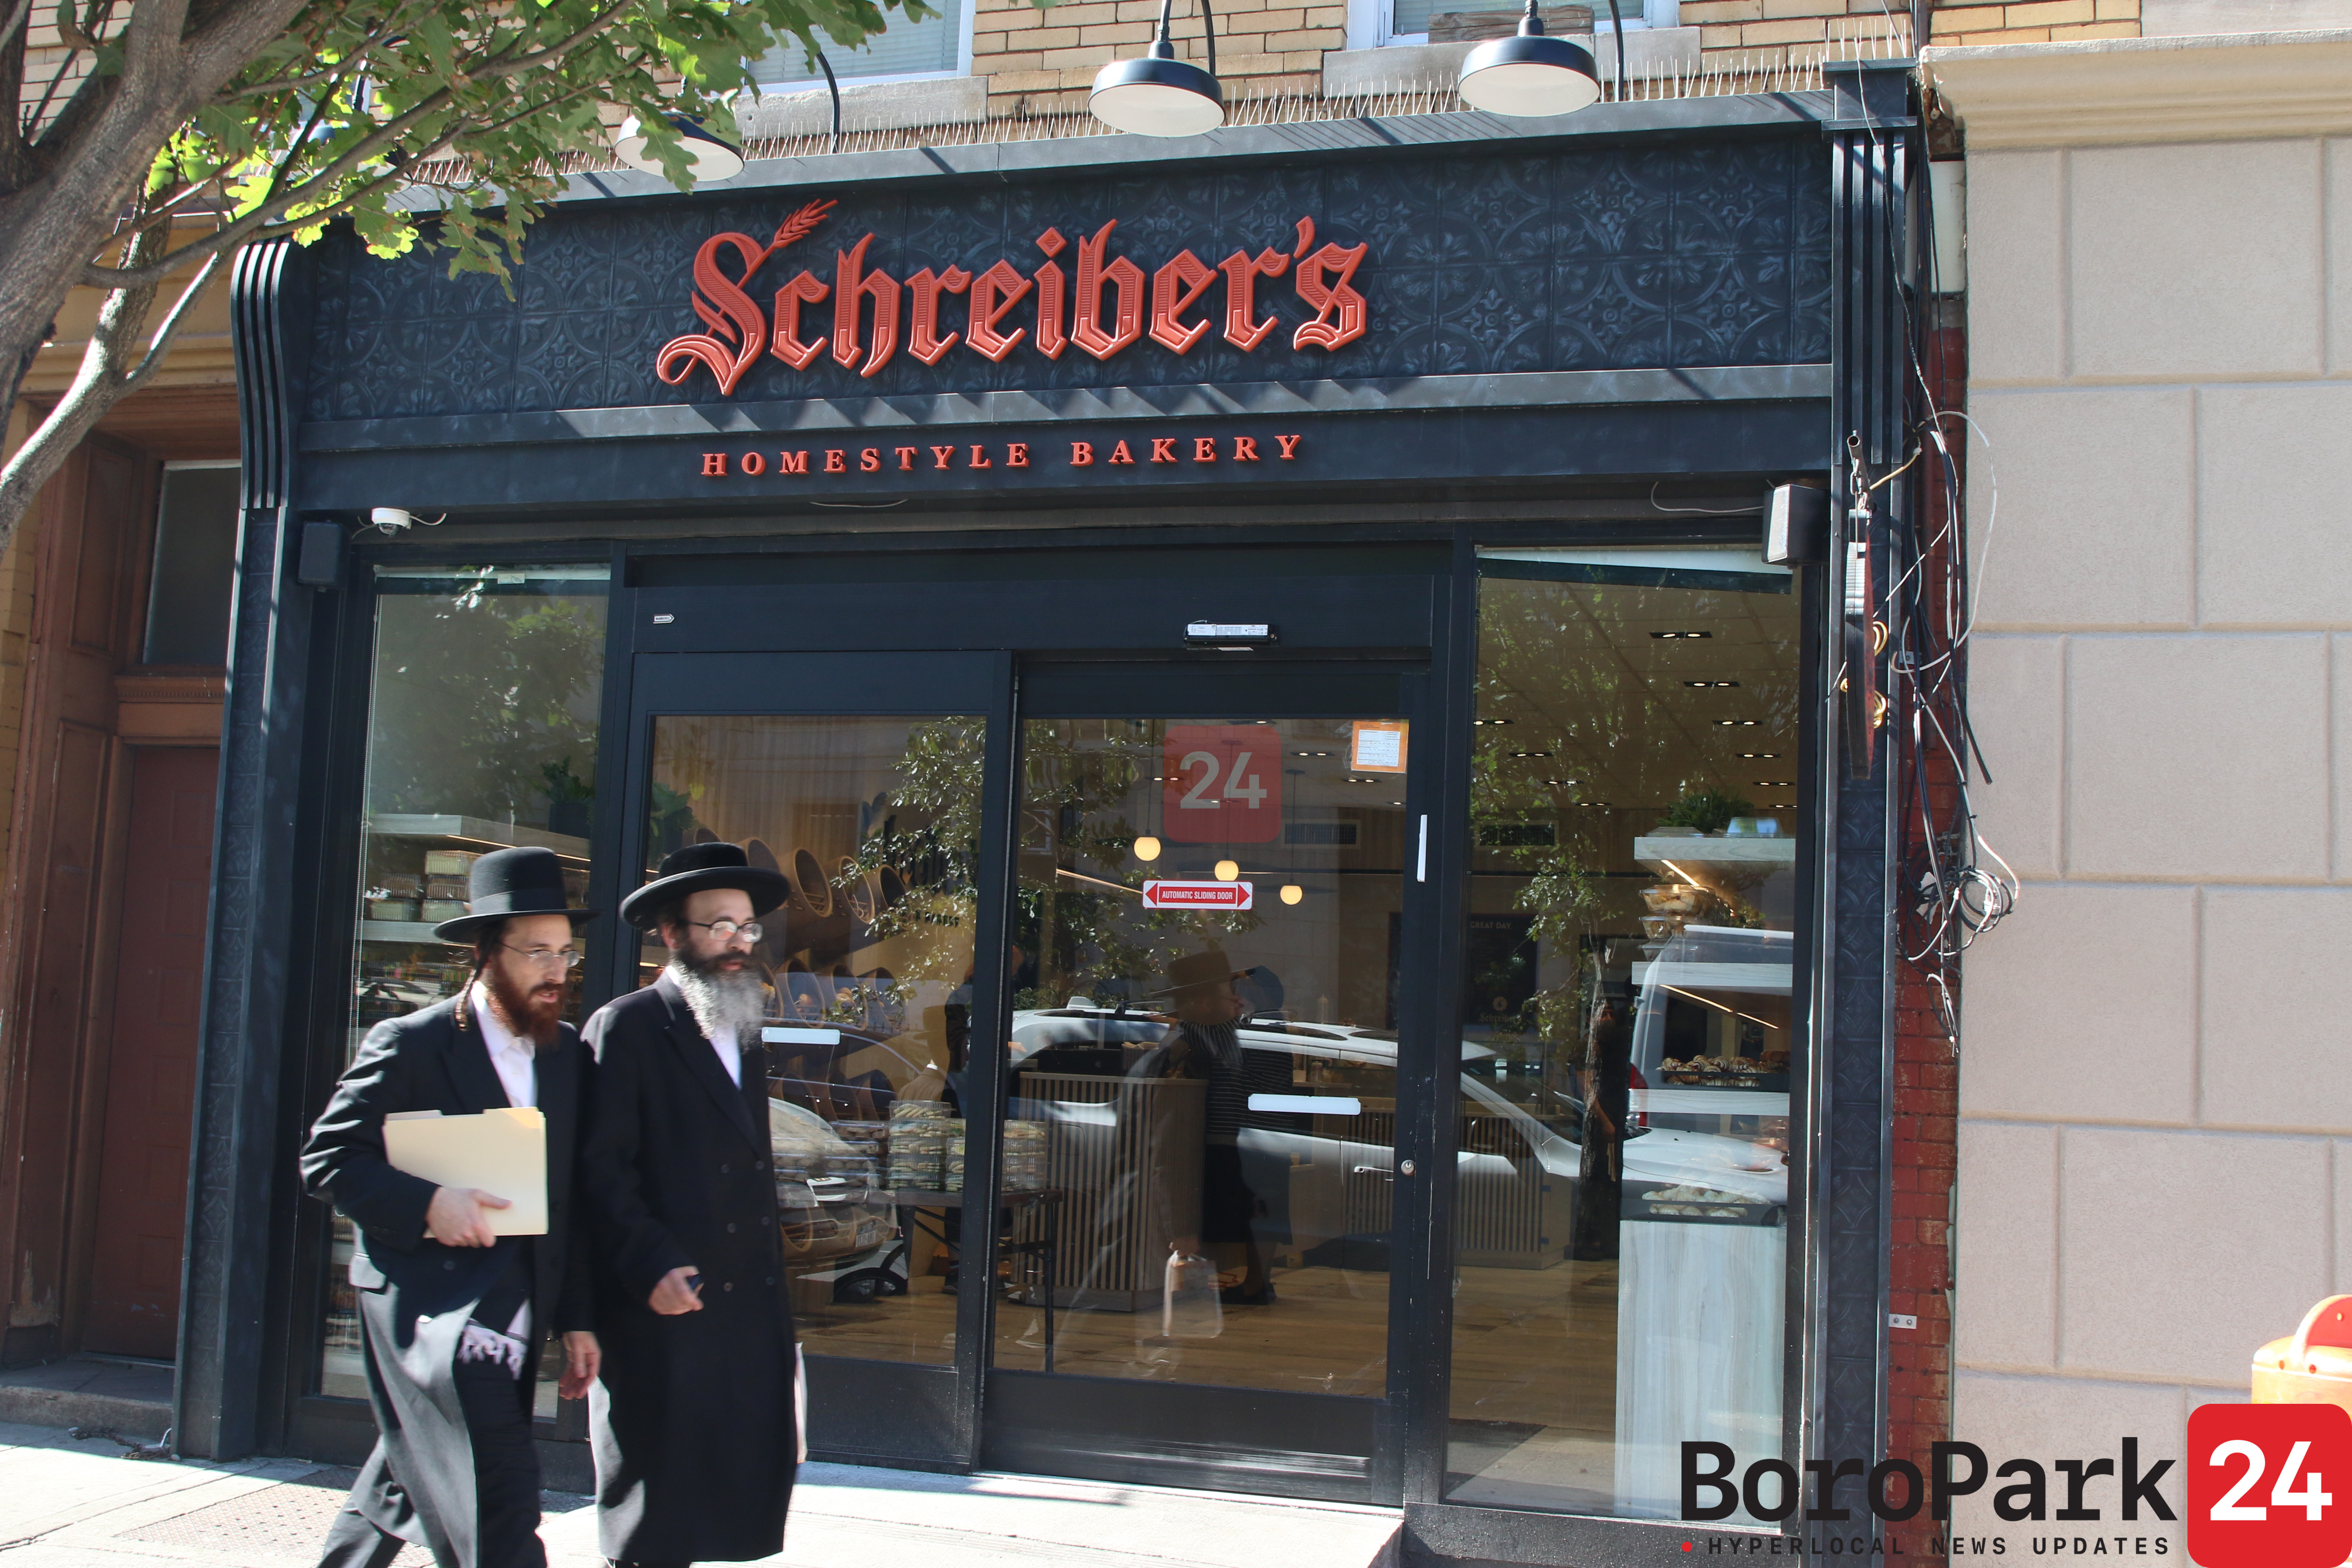 Boro Park Snapshot: Schreiber's Homestyle Bakery